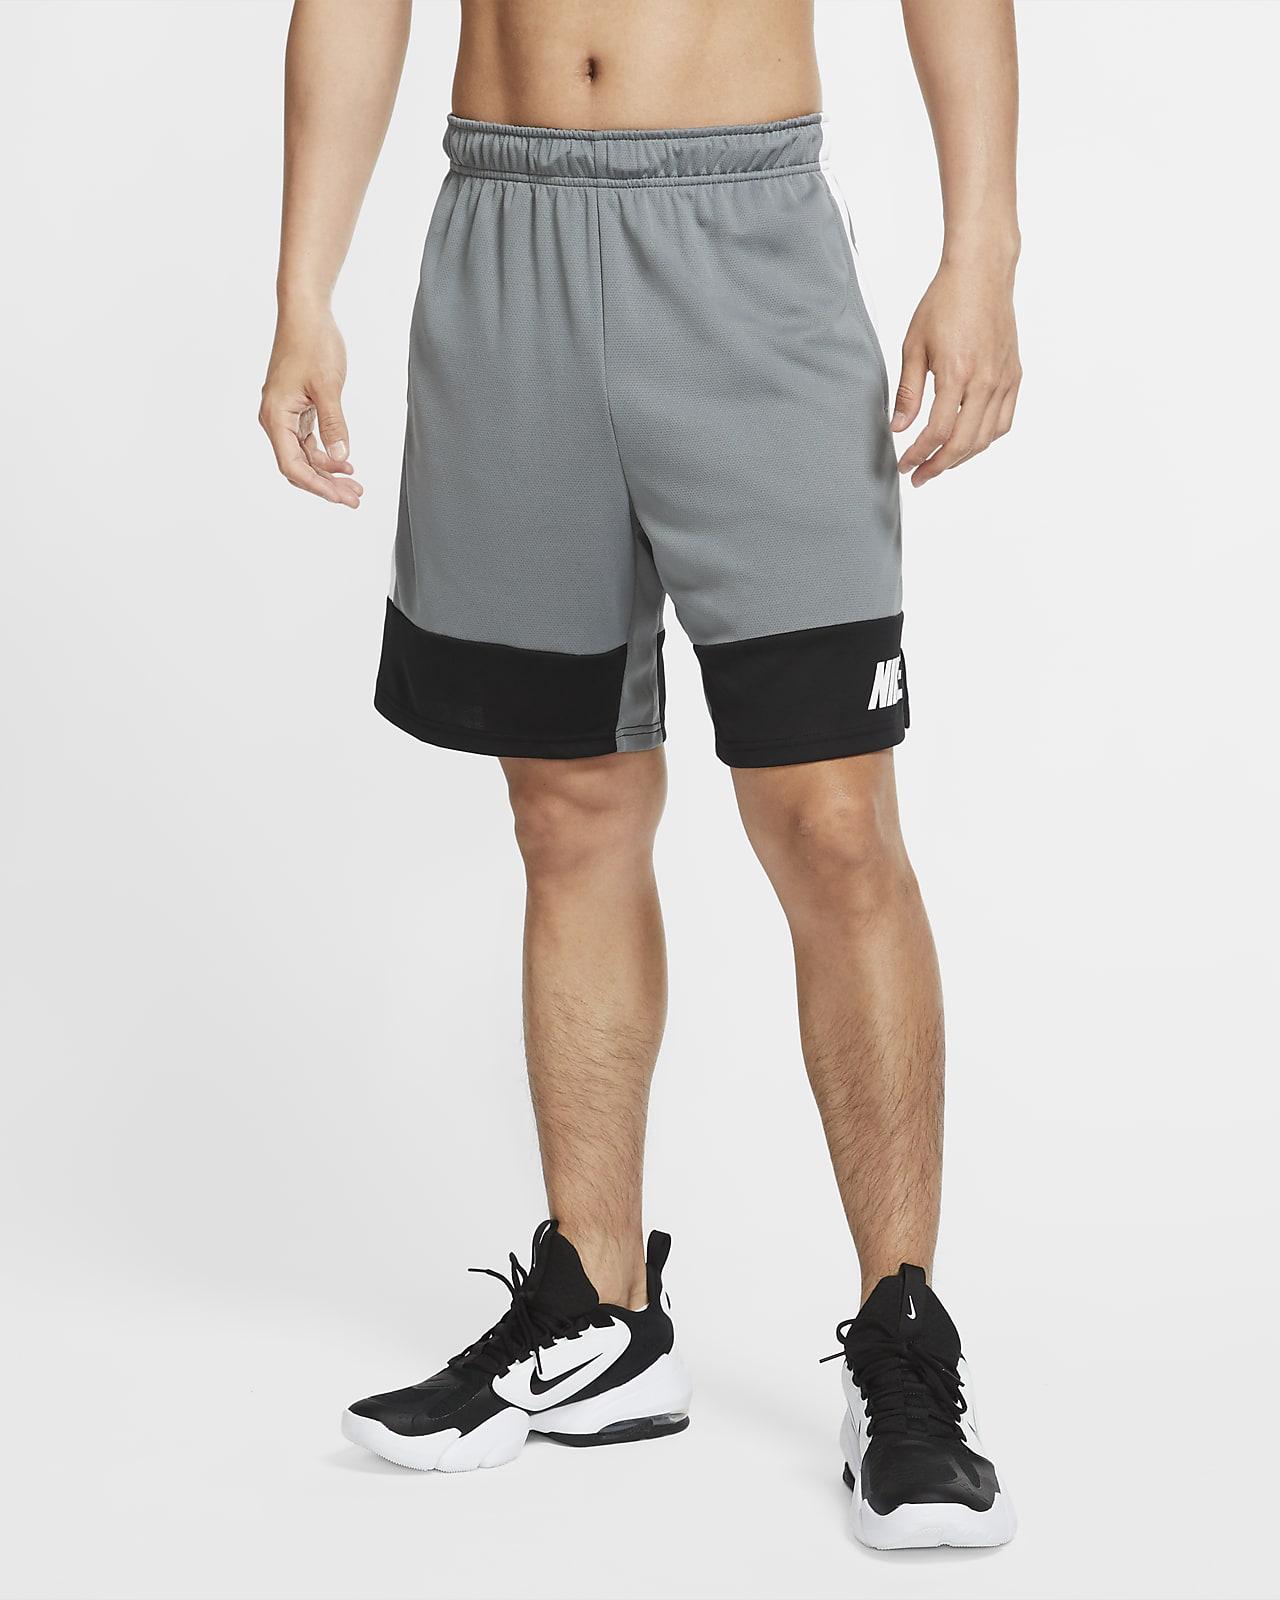 Shorts da training Nike Dri-FIT - Uomo